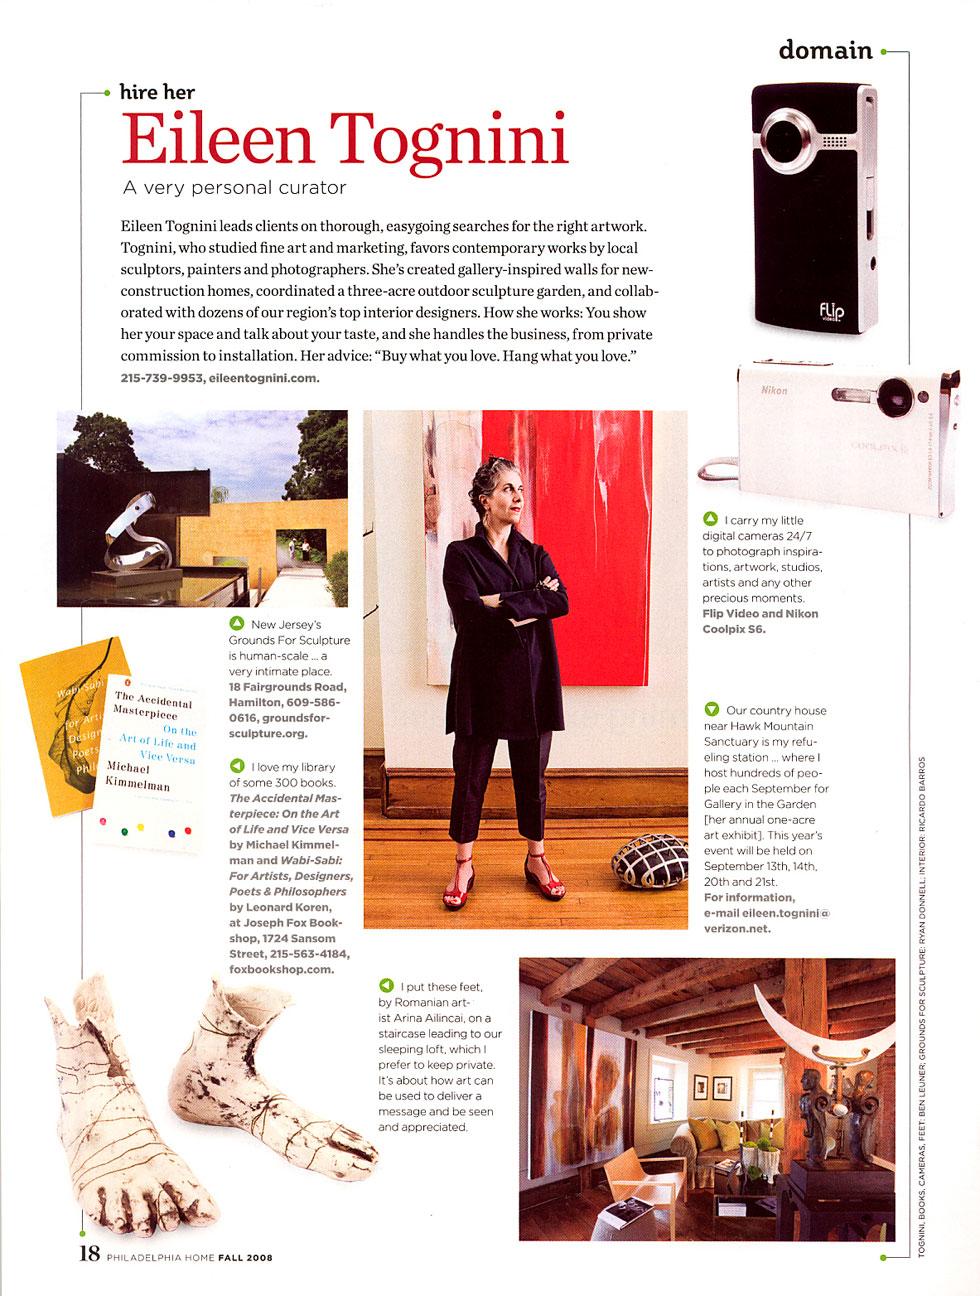 Philadelphia Home Magazine on Eileen Tognini